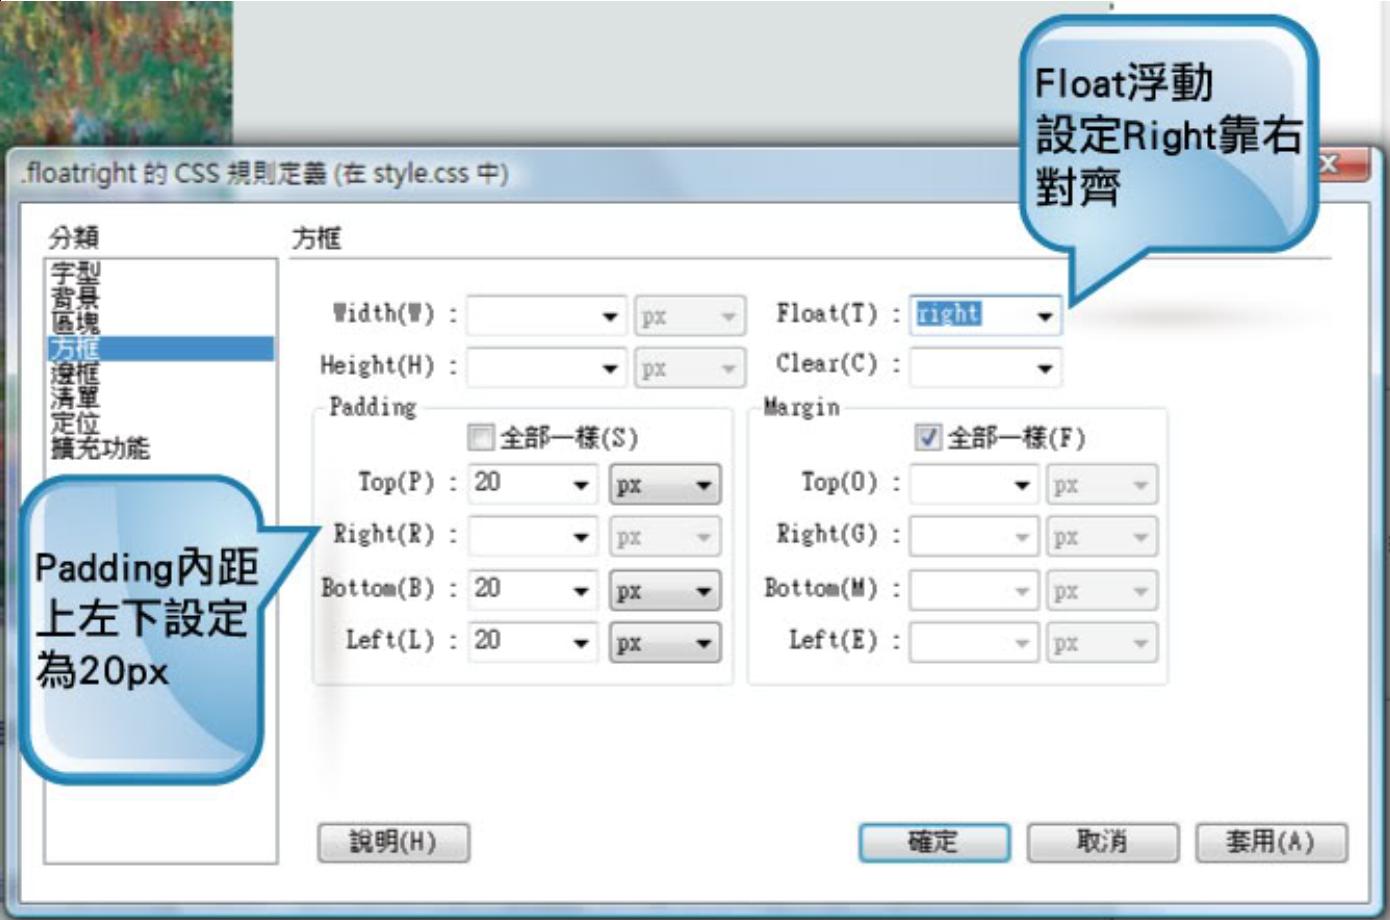 http://mepopedia.com/~jinjin/web/img/509.png